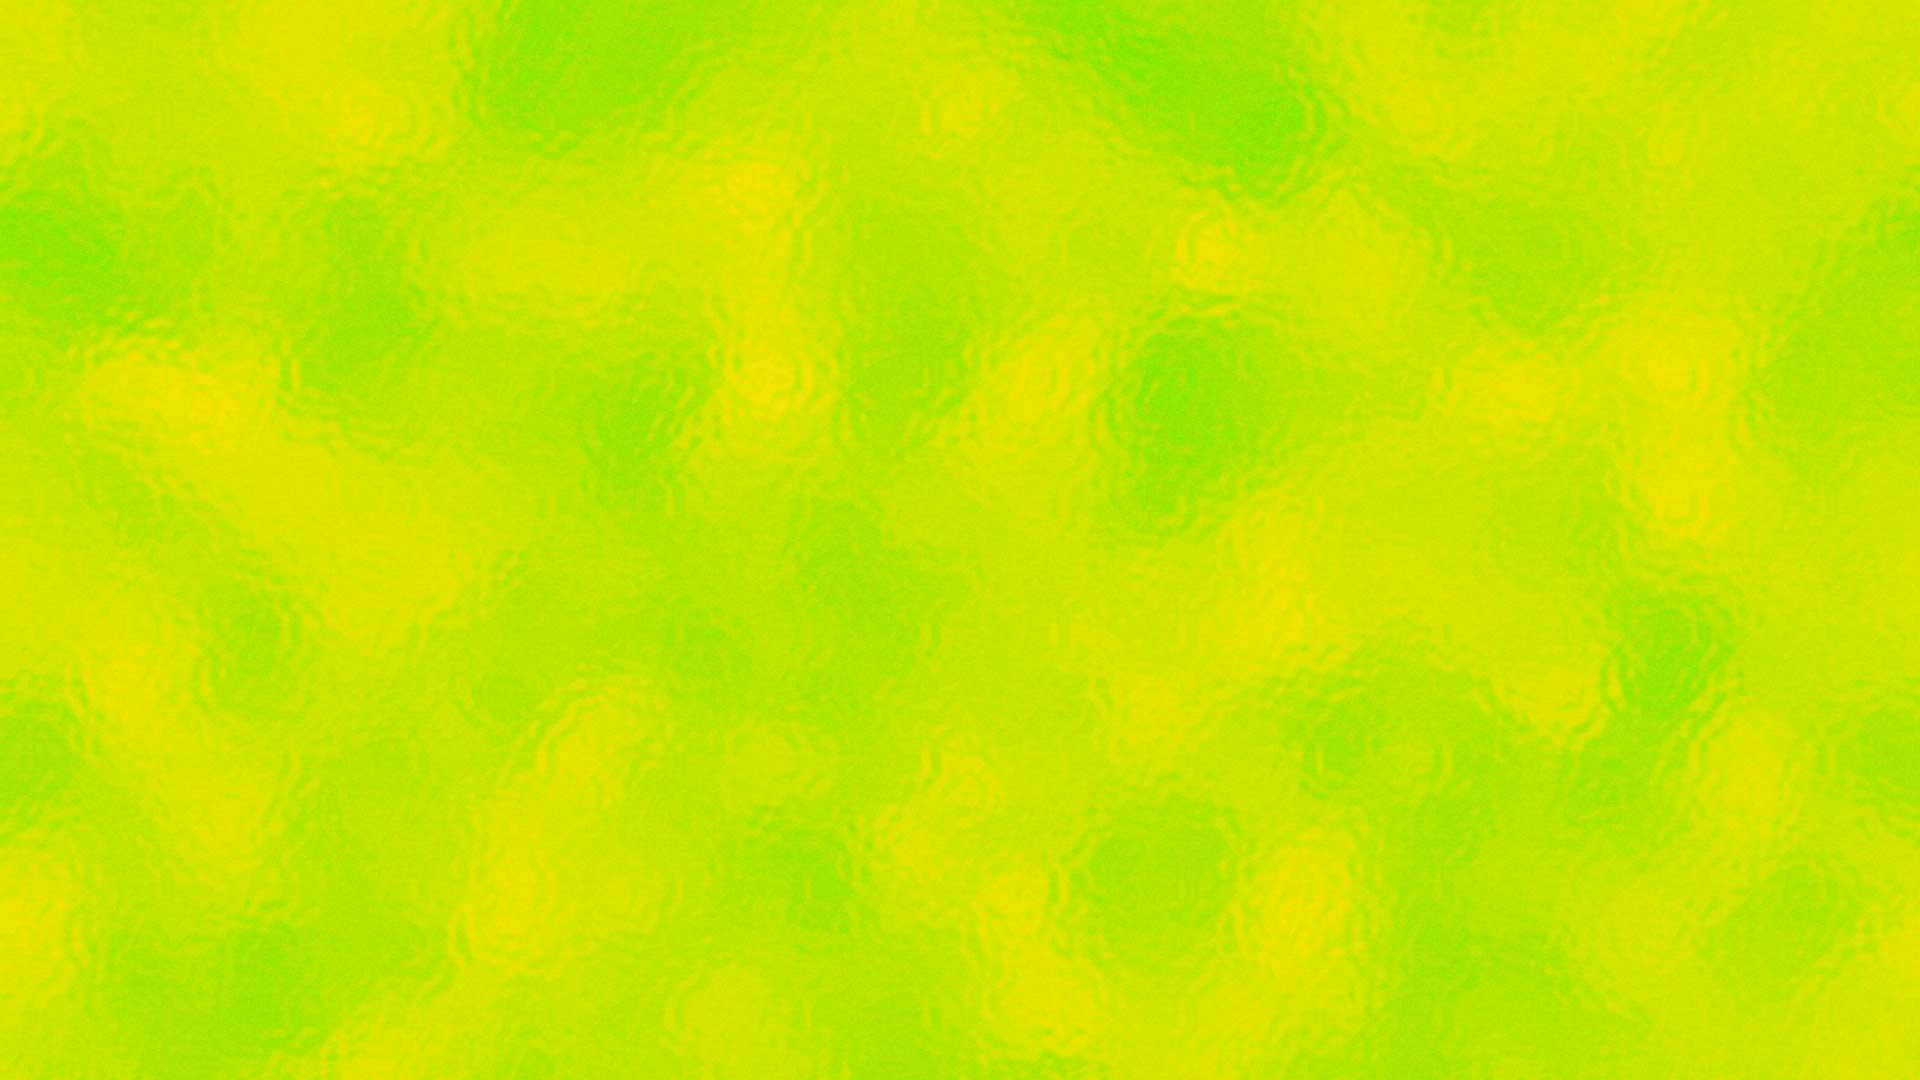 1920x1080px Yellow And Green Wallpaper Wallpapersafari